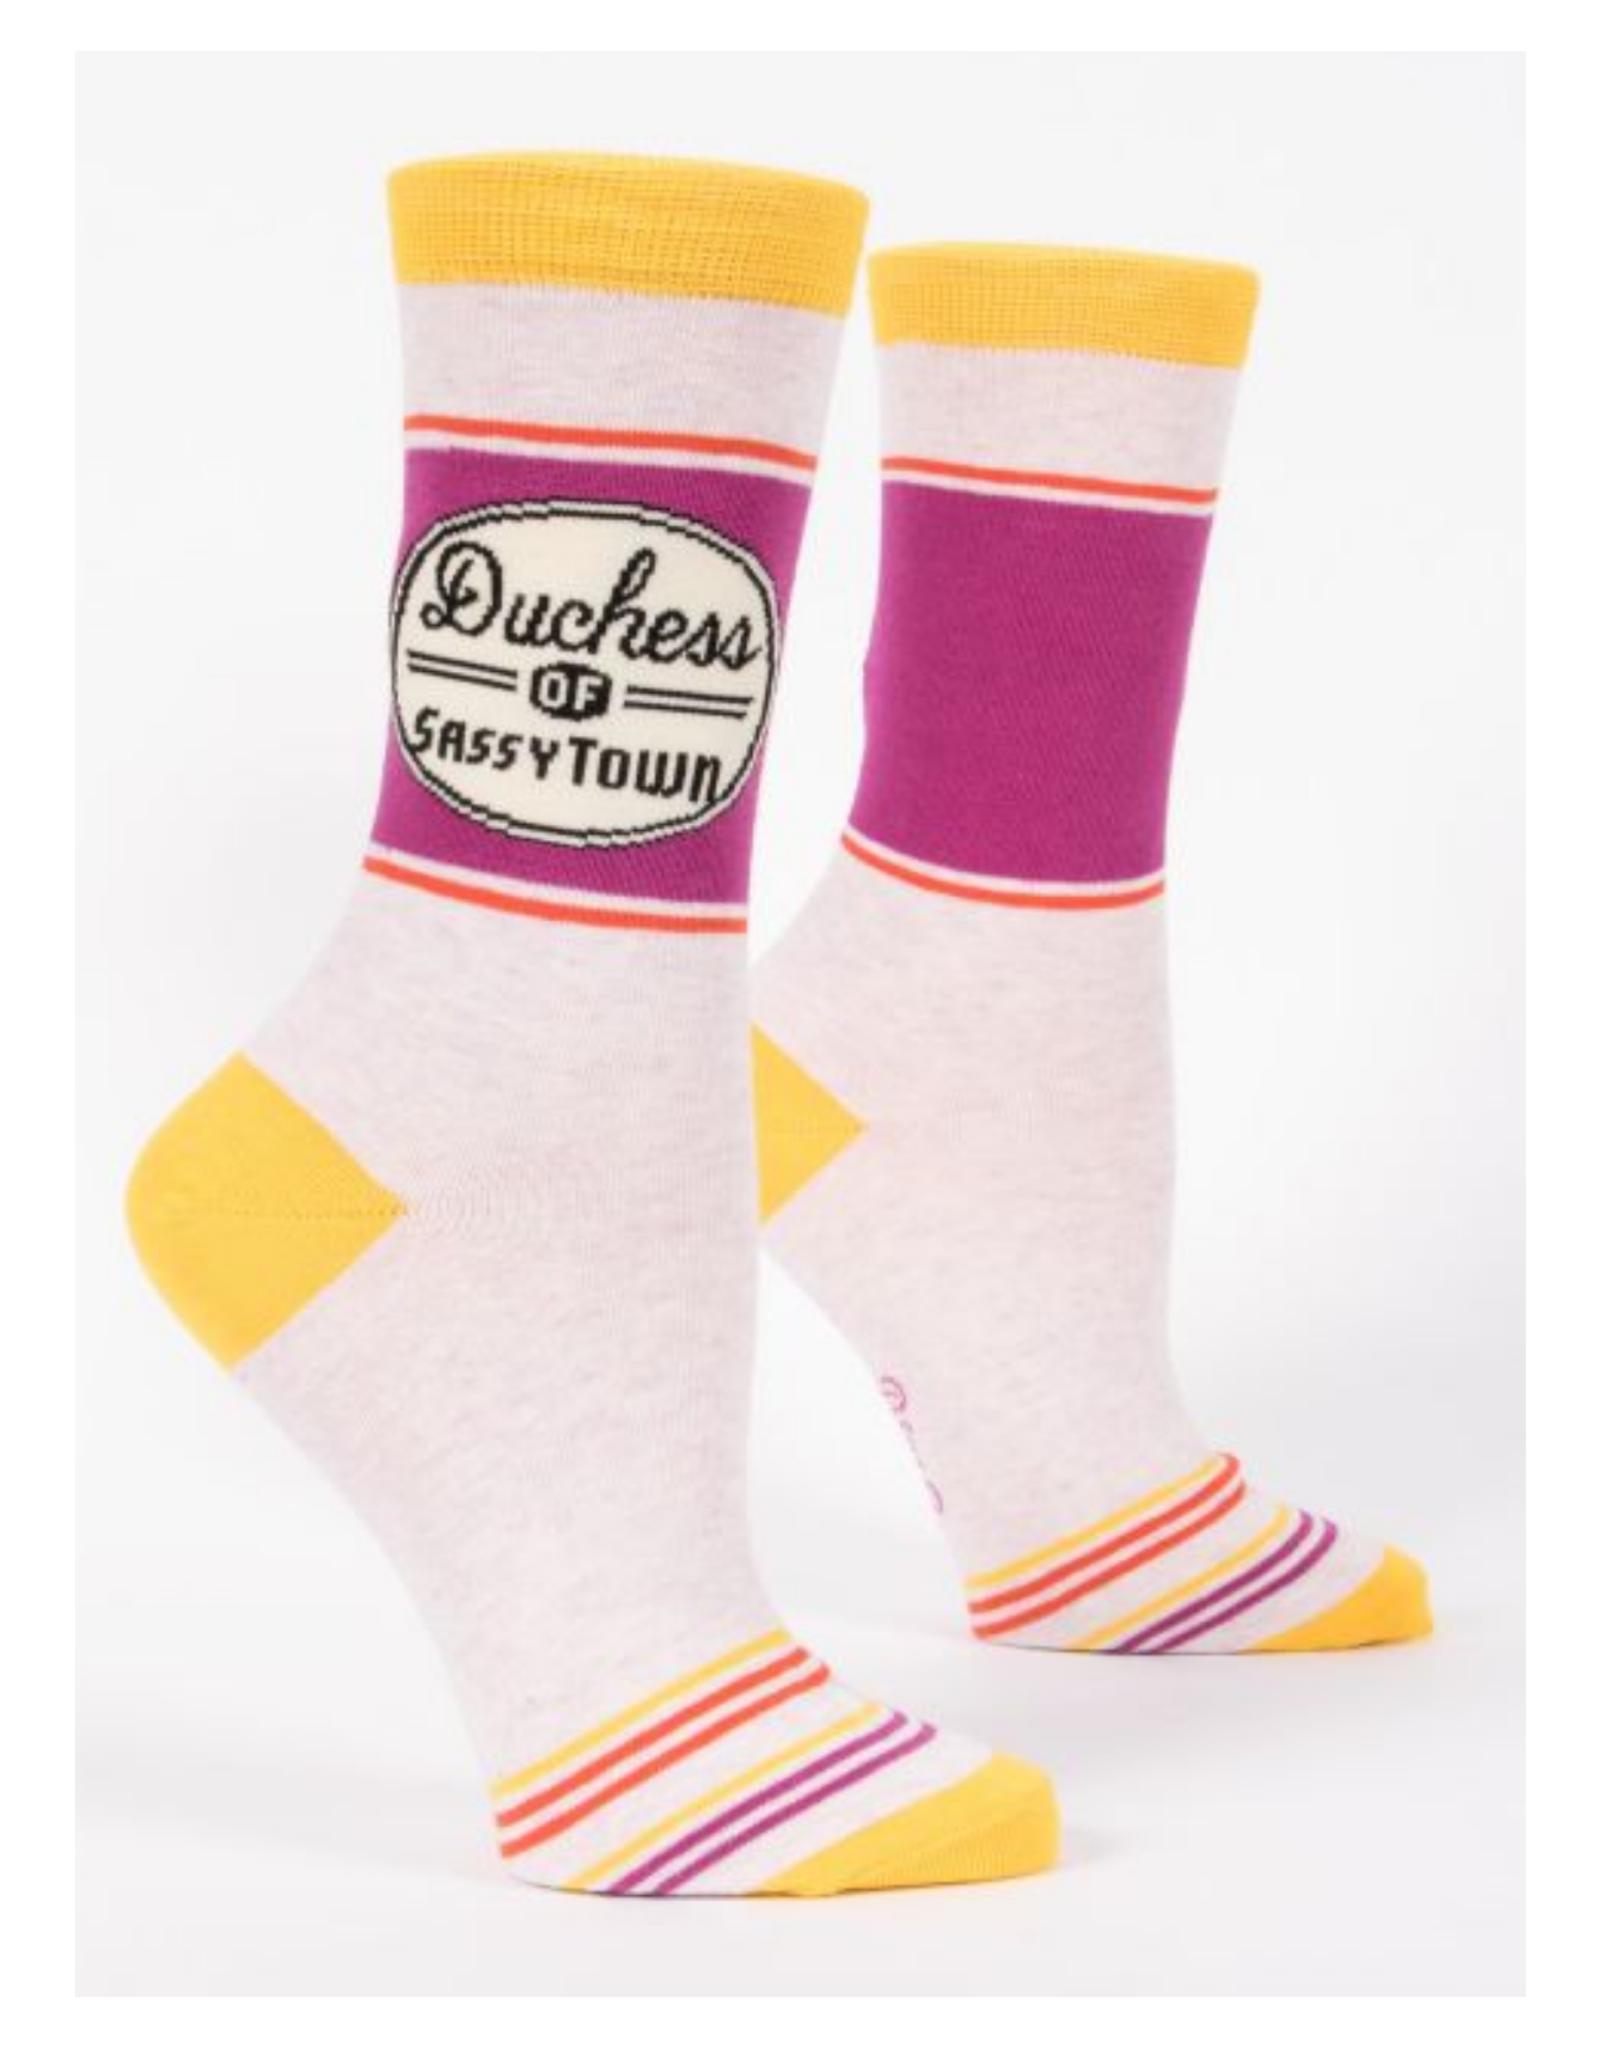 Duchess of Sassytown Women's Crew Socks